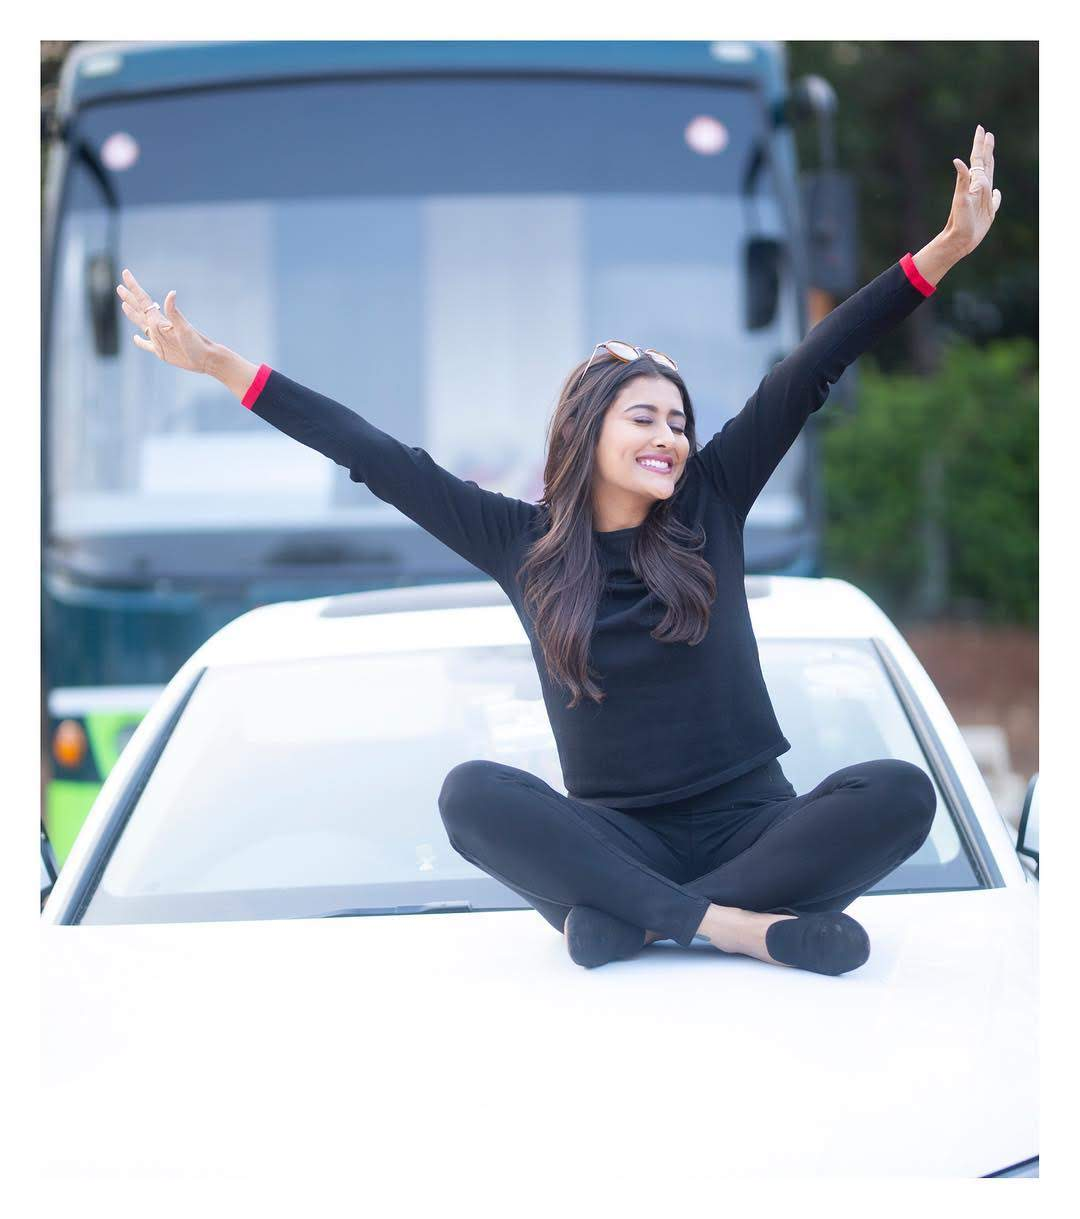 Pooja-Jhaveri-611609